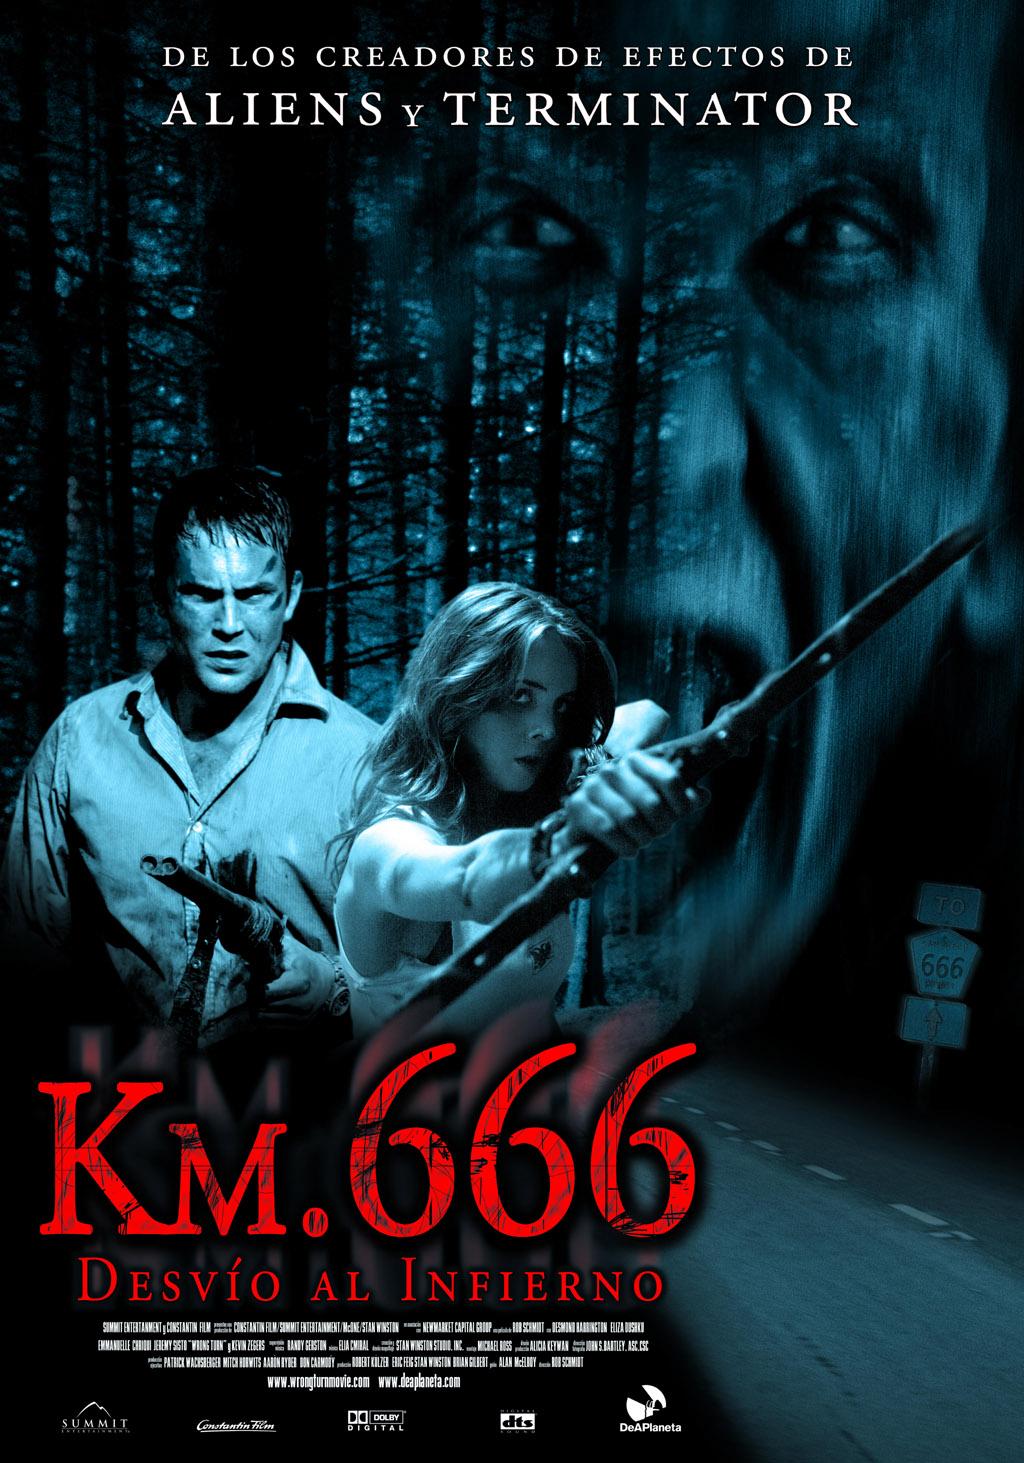 km 666 pelicula: